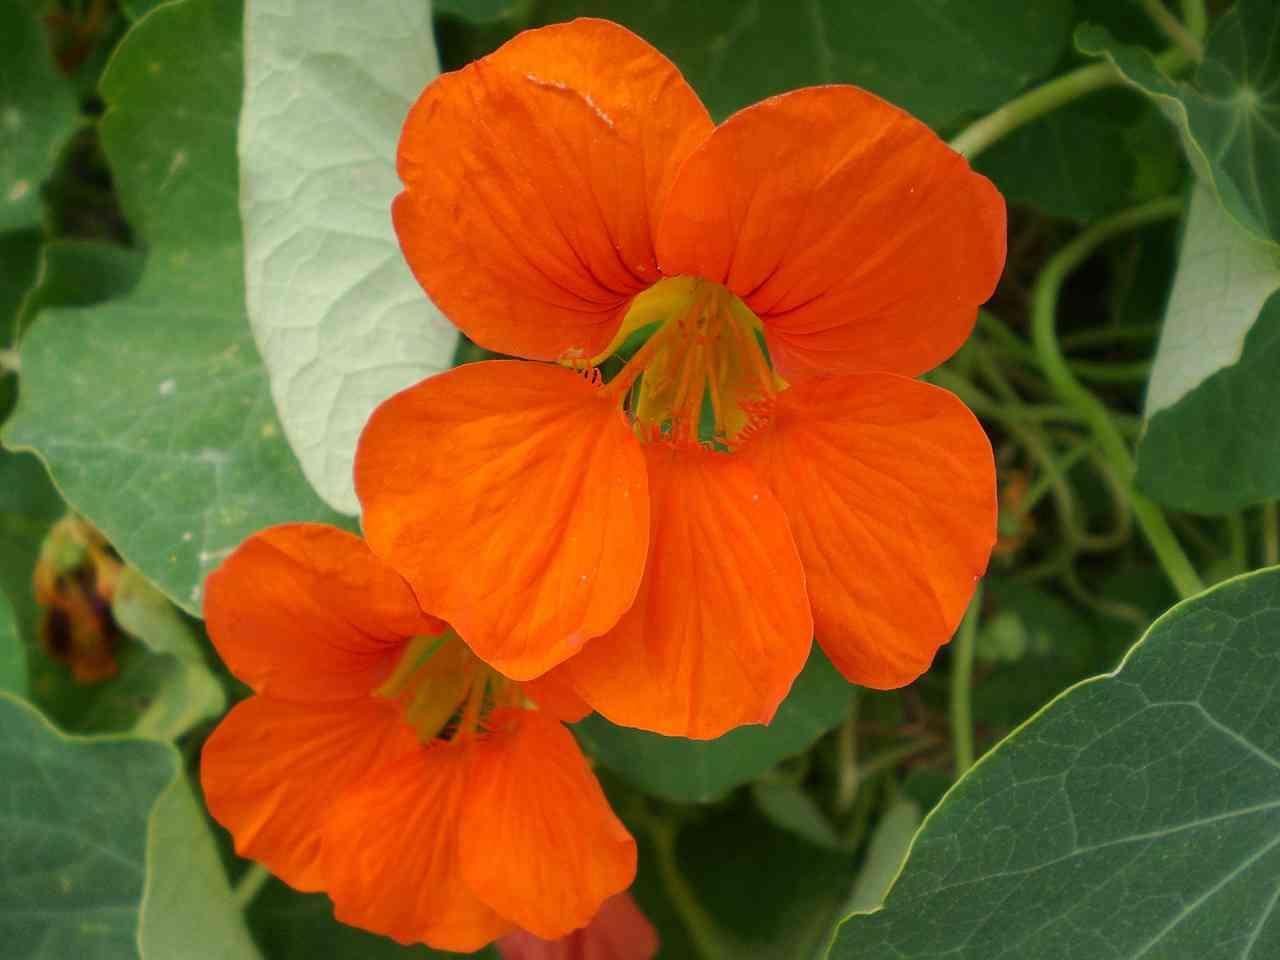 hoa sen cạn đẹp nhất 2